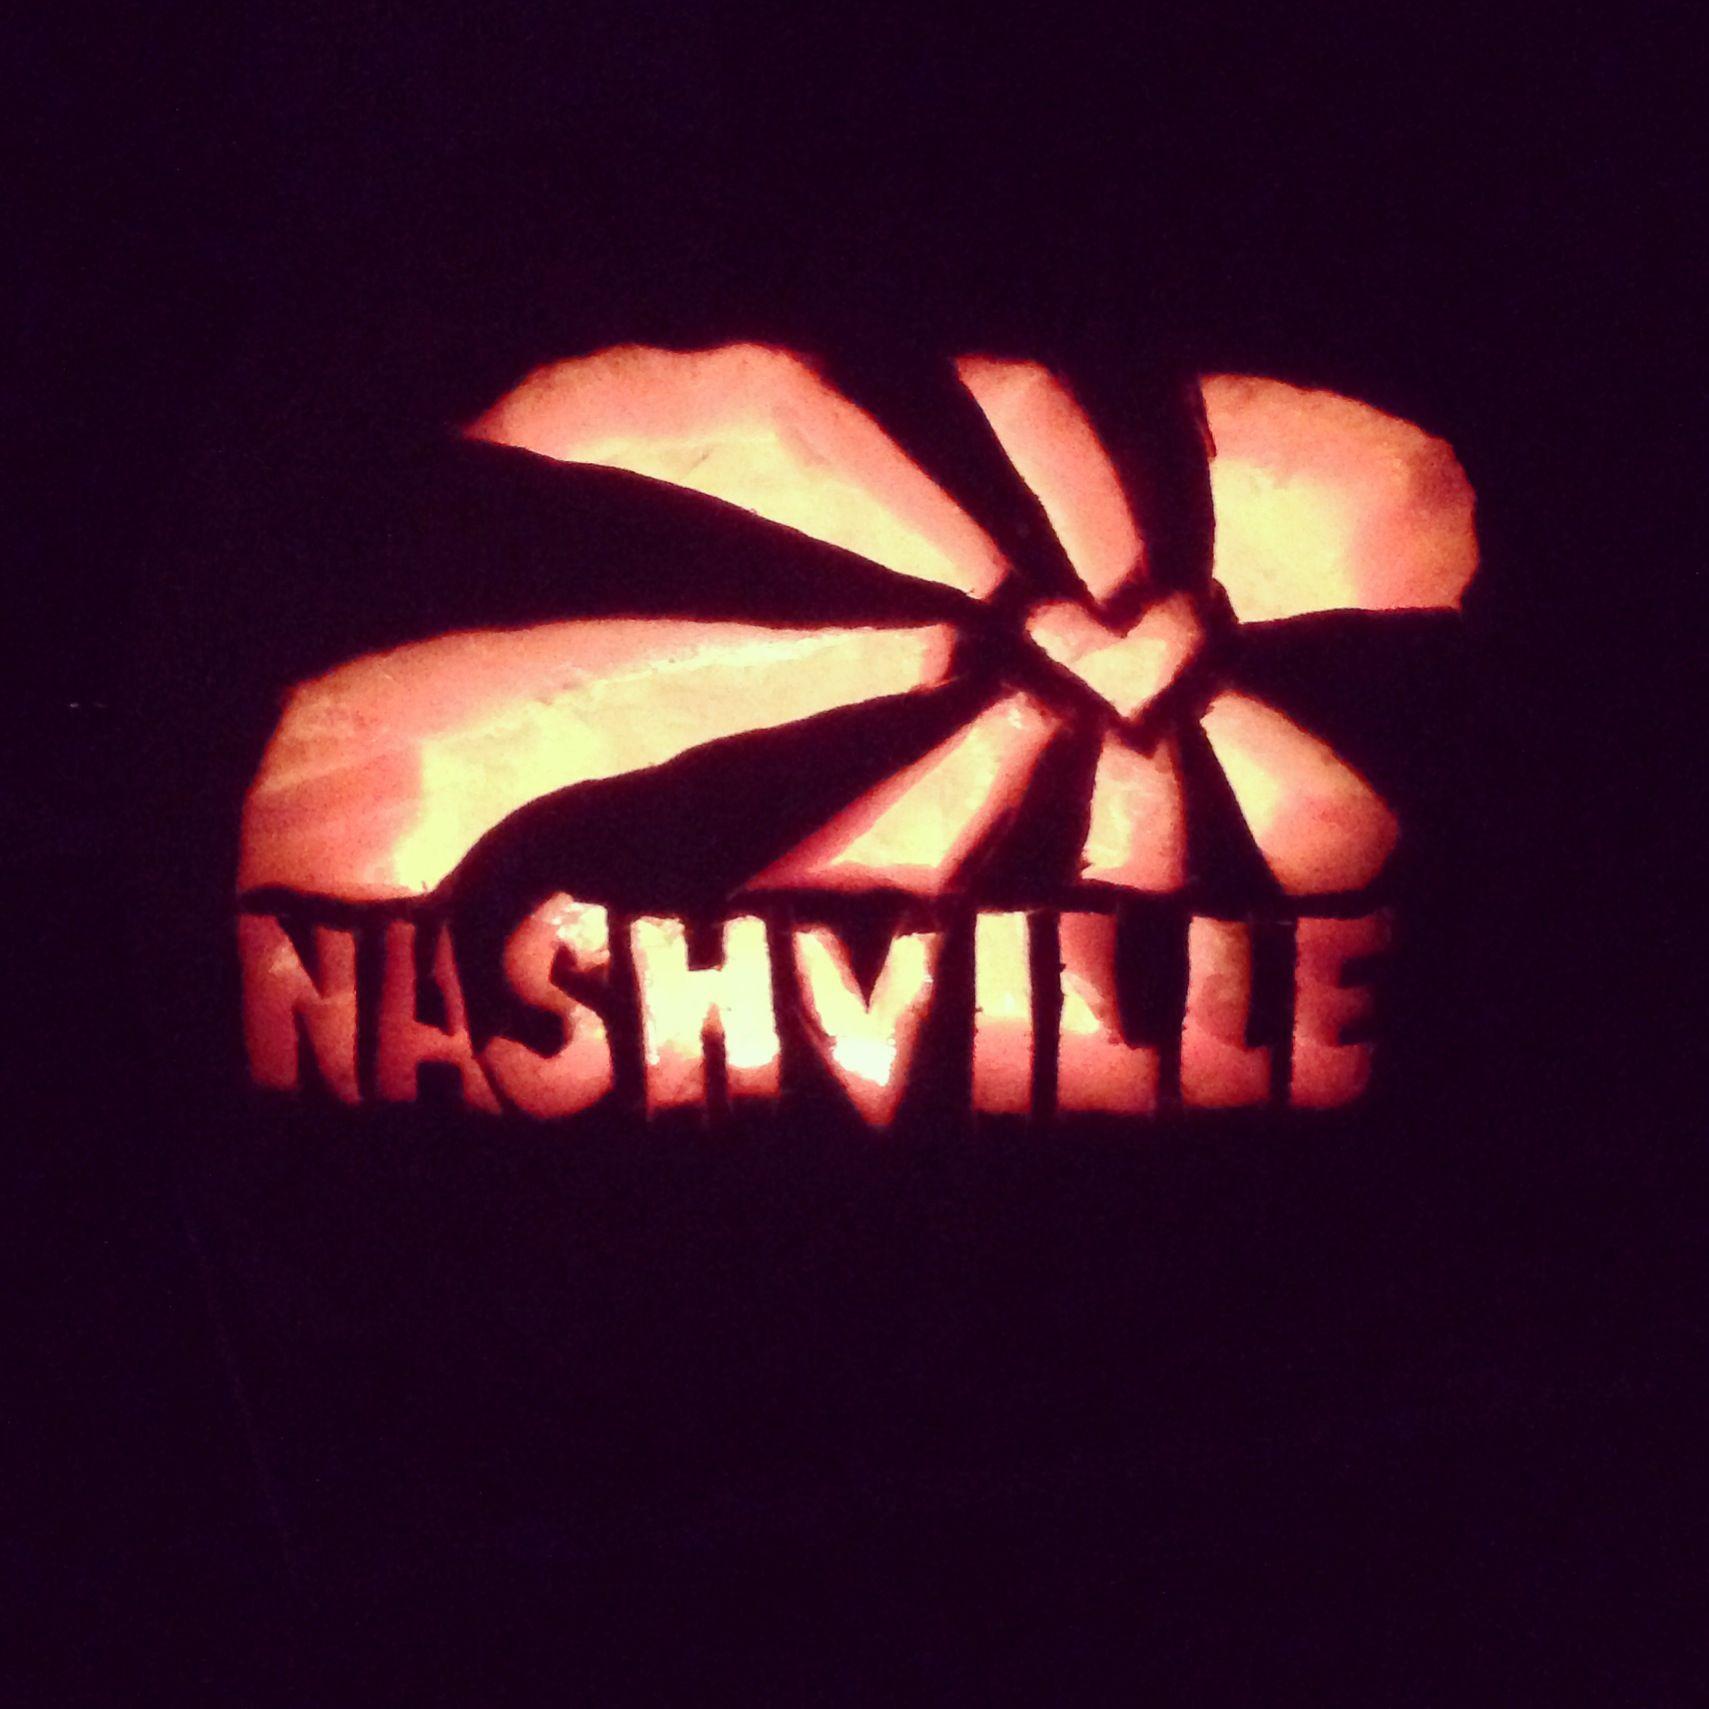 Carved pumpkin nashville halloween Pumpkin carving